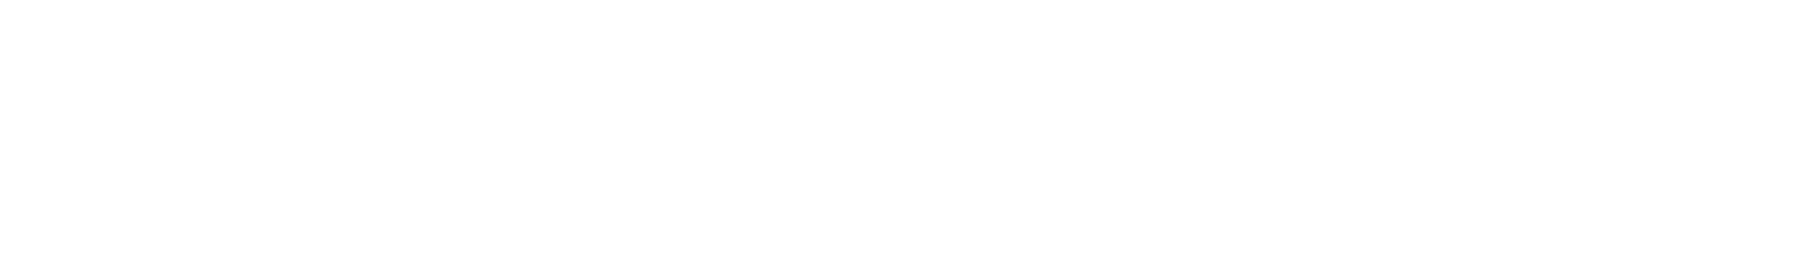 widepad synthloop 125